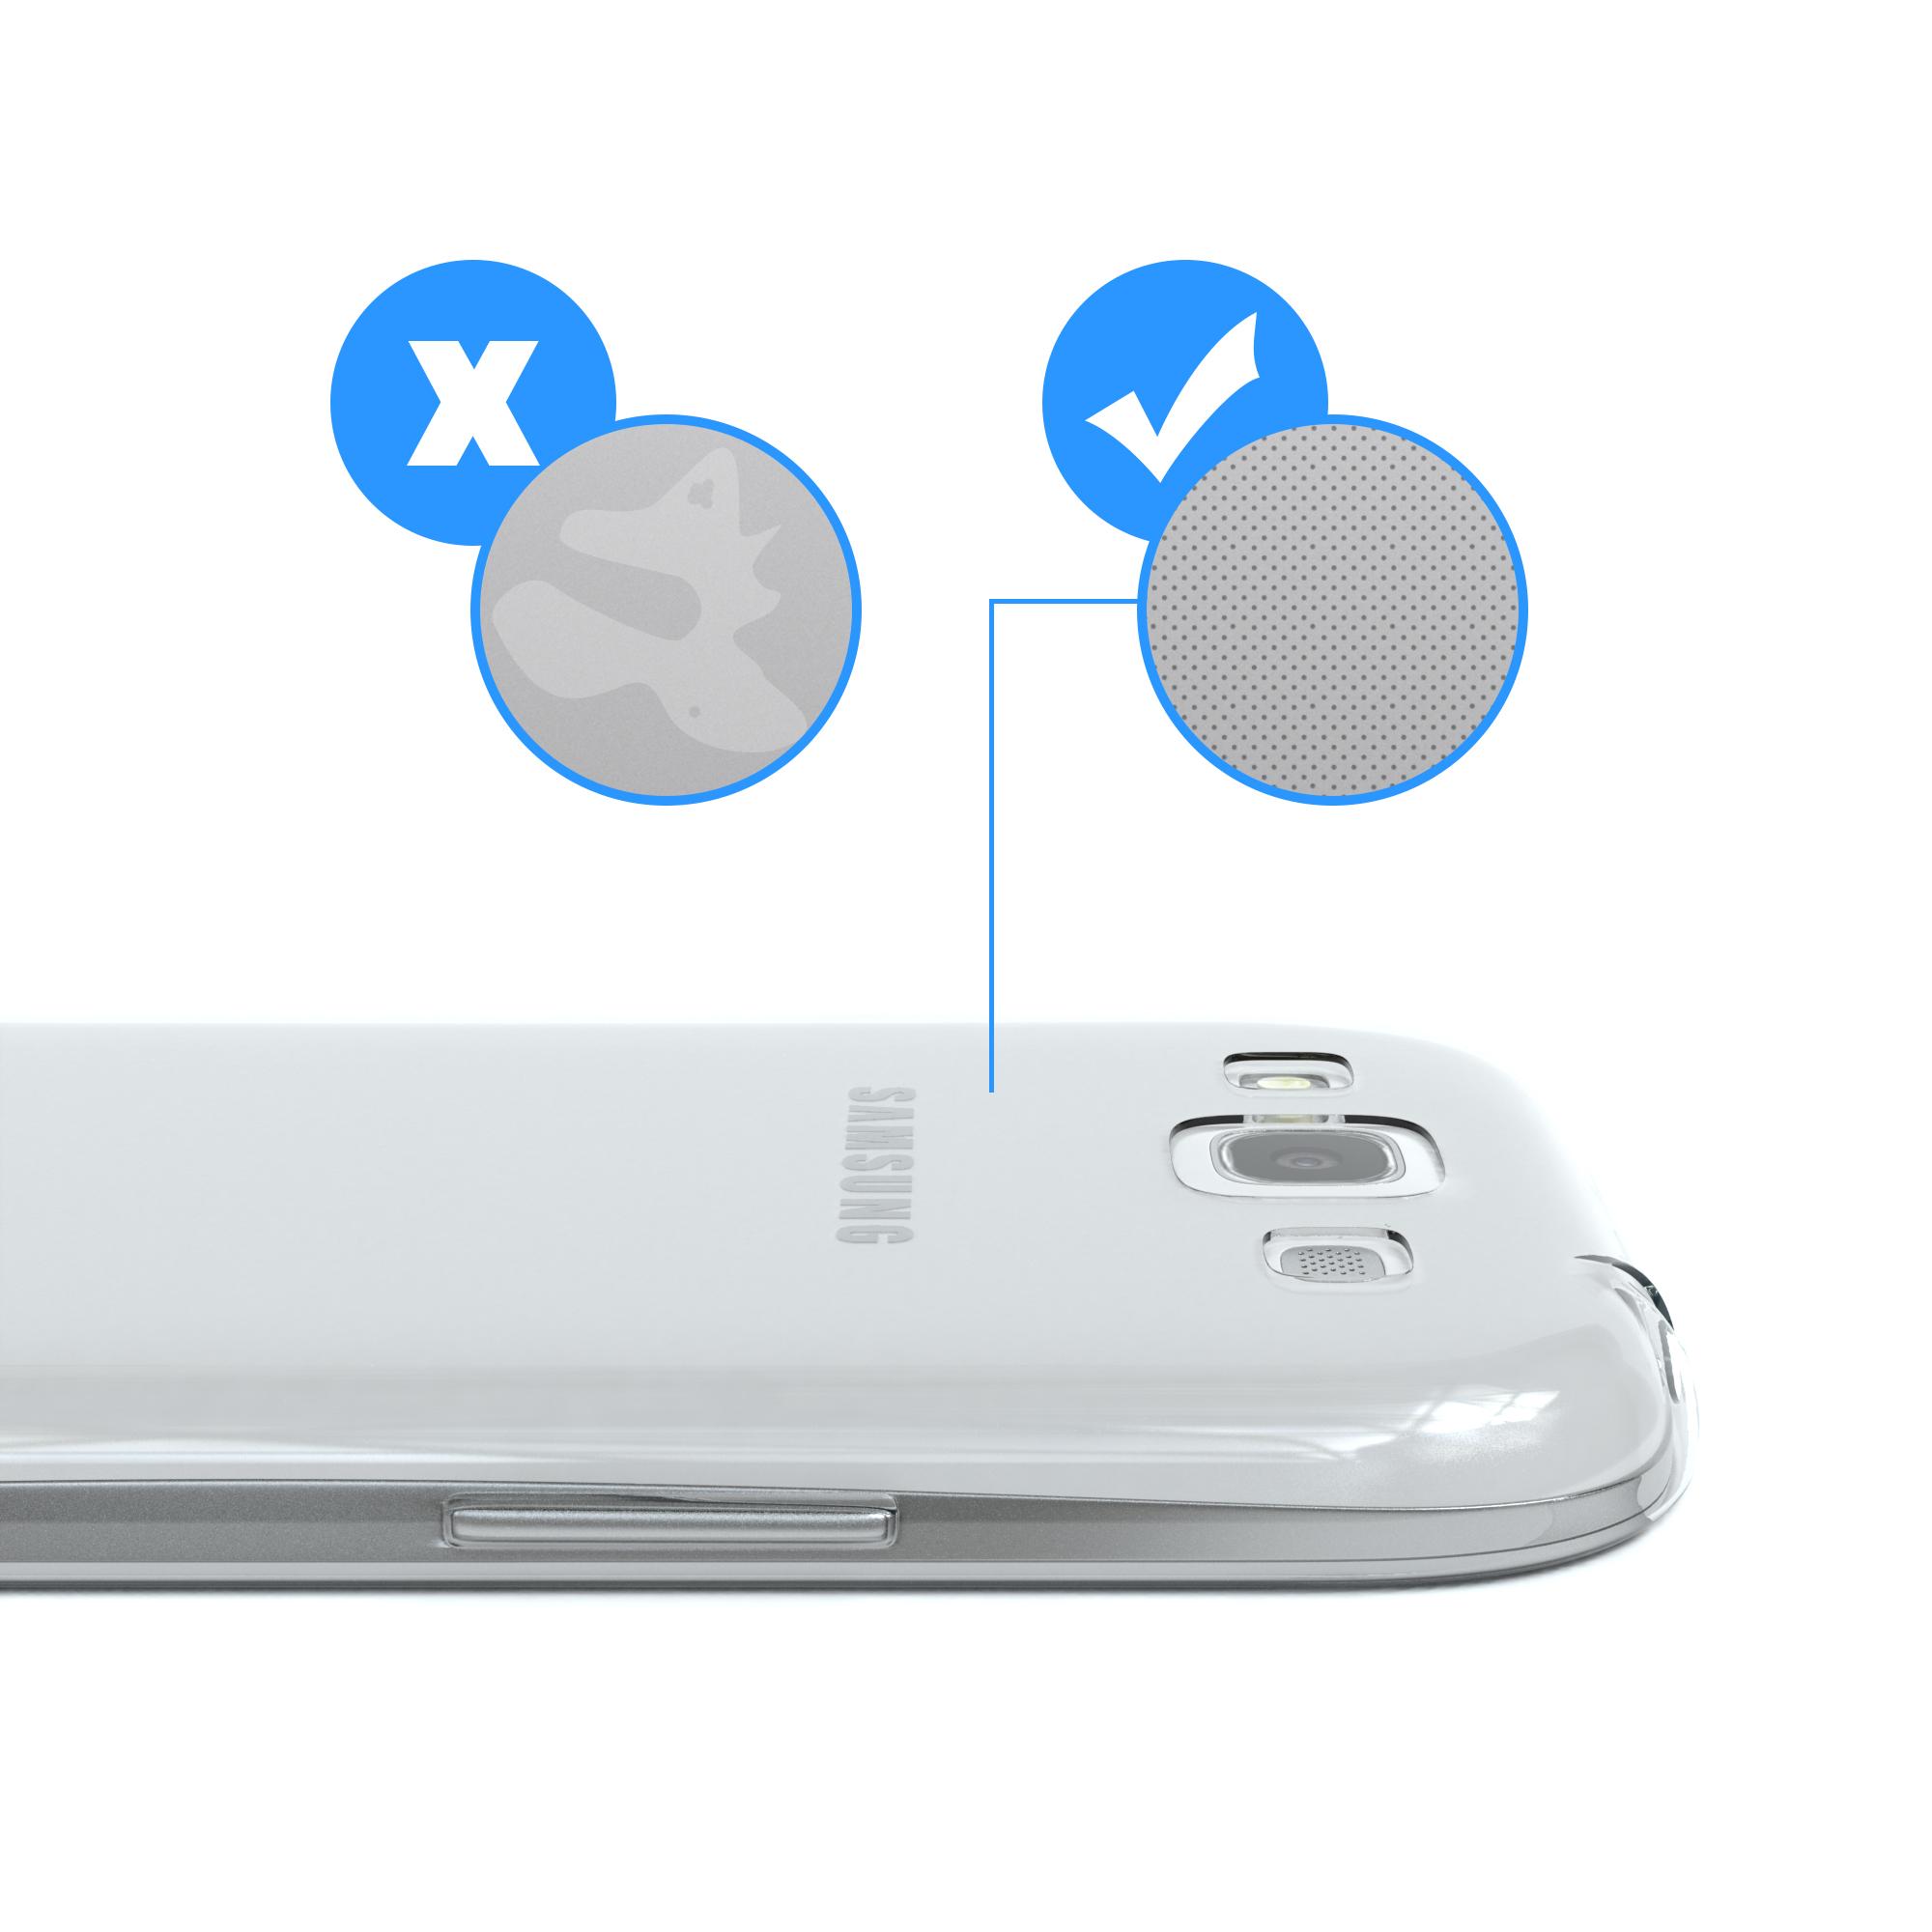 Samsung Galaxy S3 S3 Neo Hülle Silikon Case Cover Handy ...